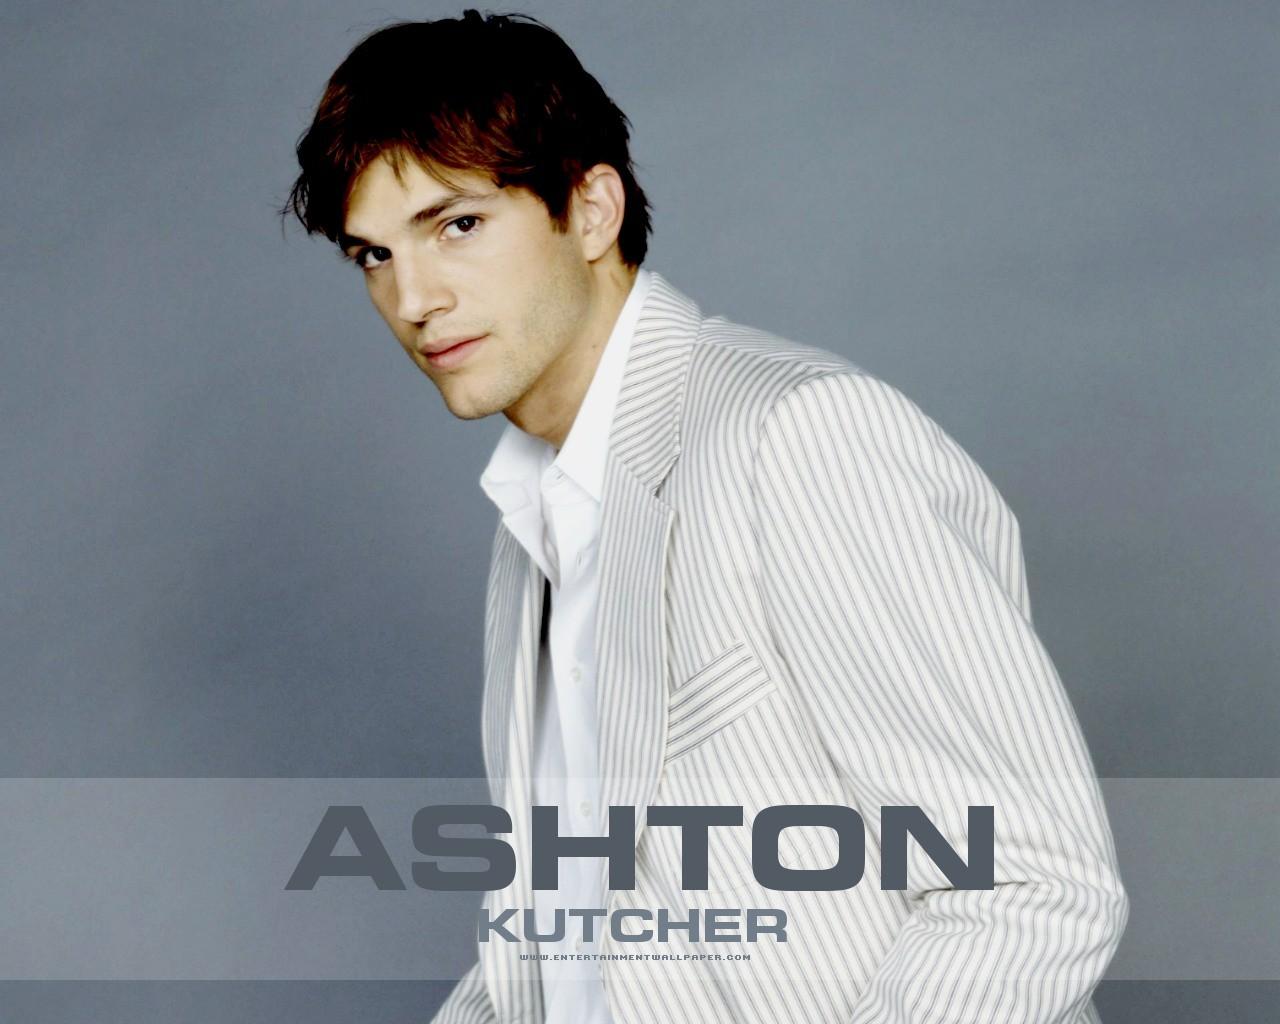 Ashton Kutcher Ashton Kutcher Ashton Kutcher